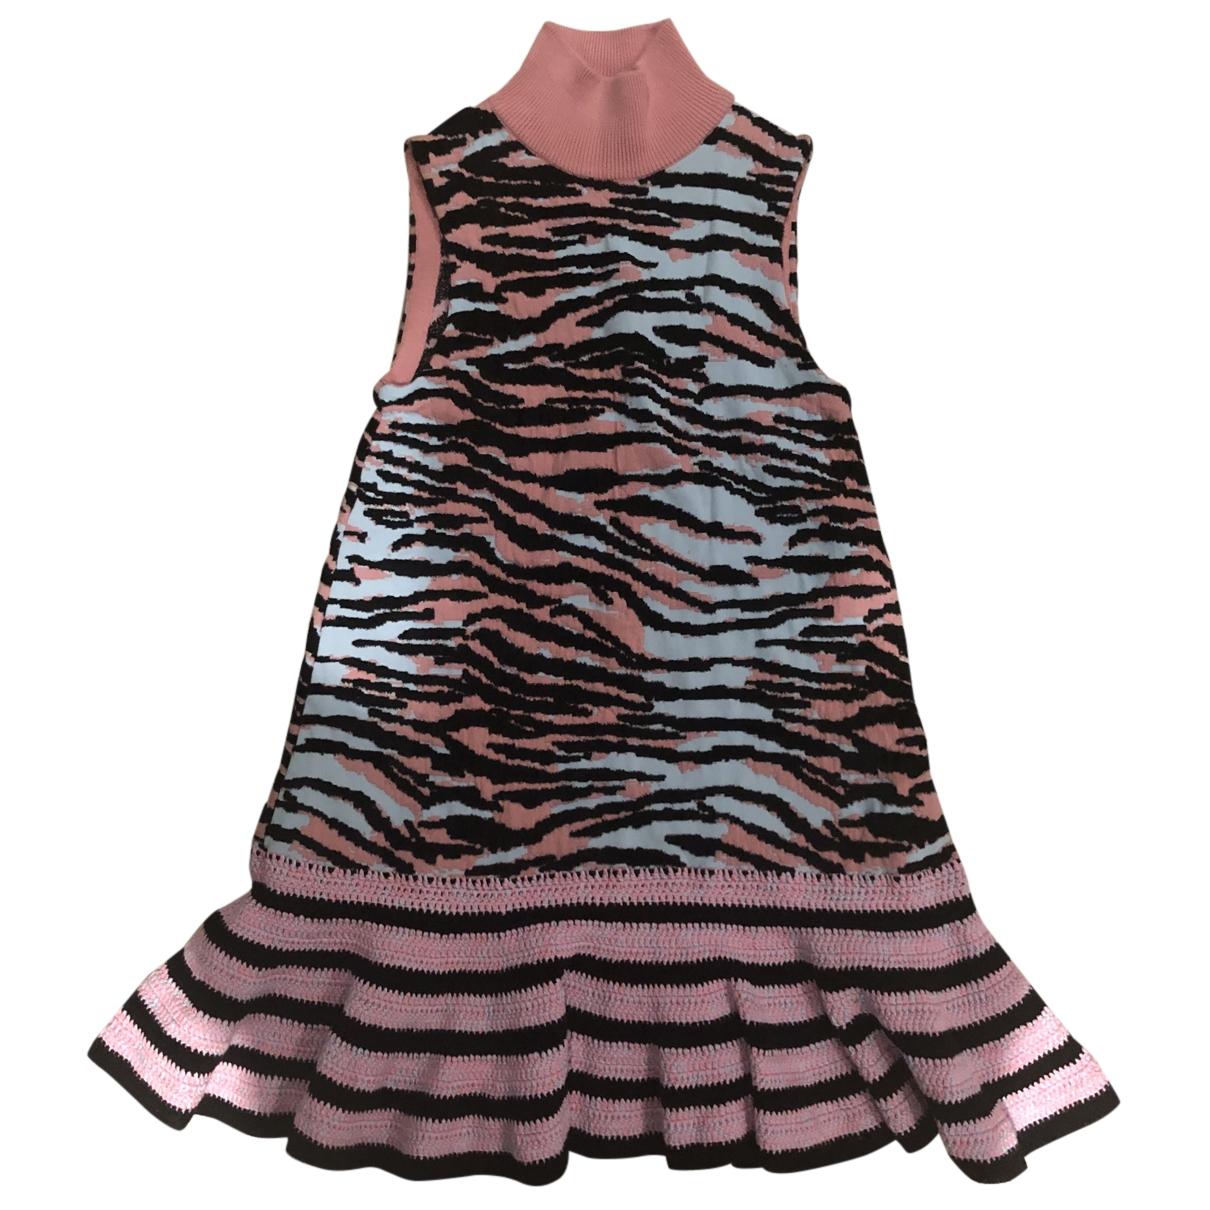 Kenzo X H&m - Robe   pour femme en coton - rose